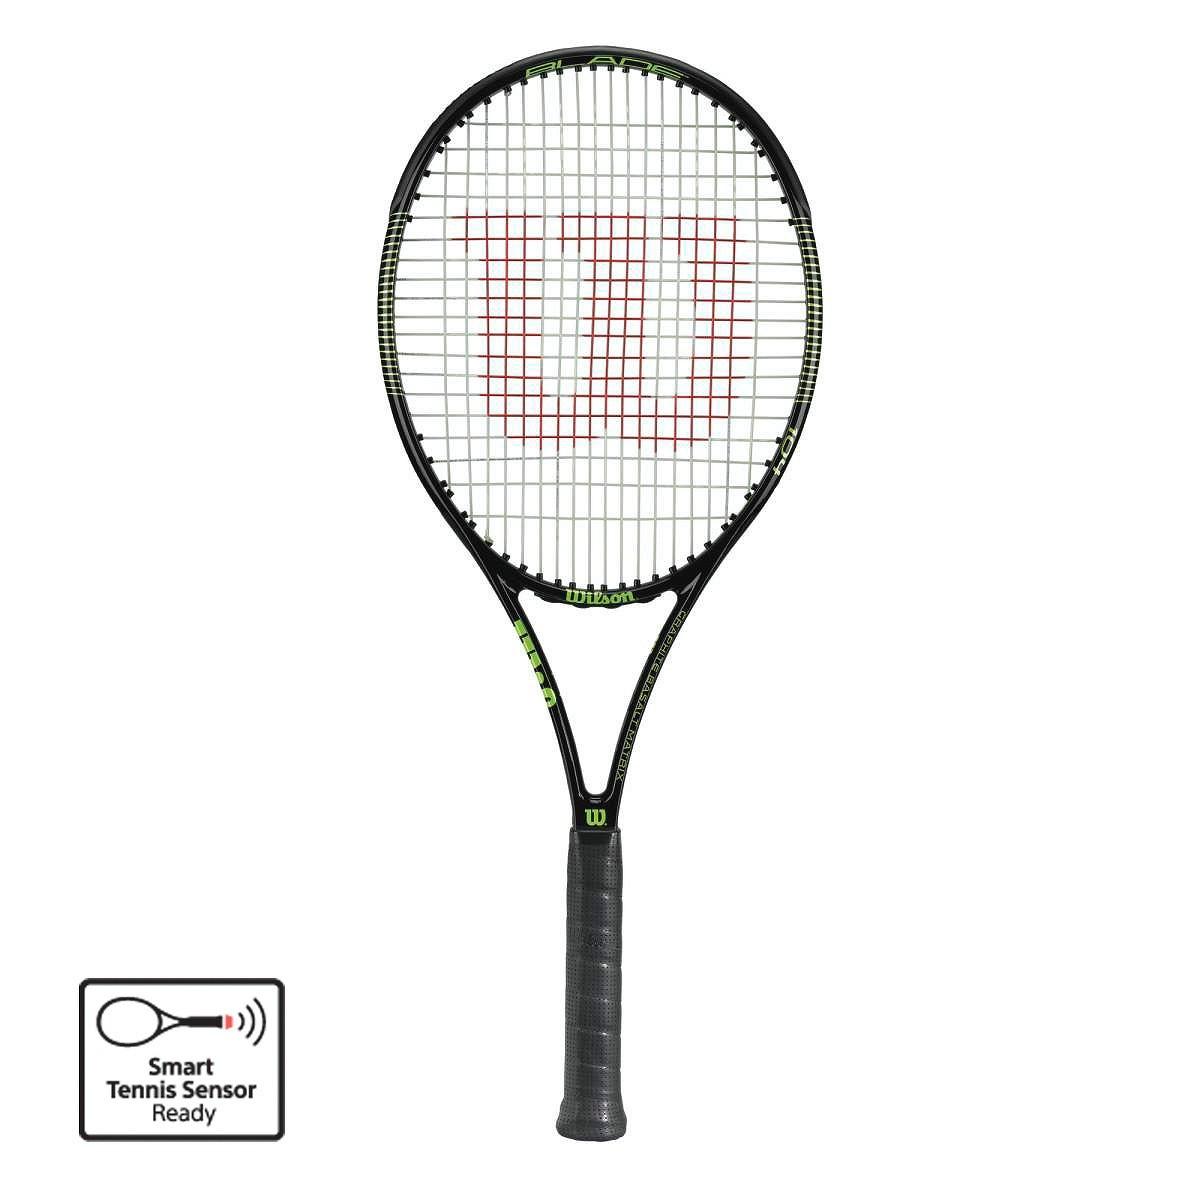 Rakieta tenisowa Wilson Blade 104